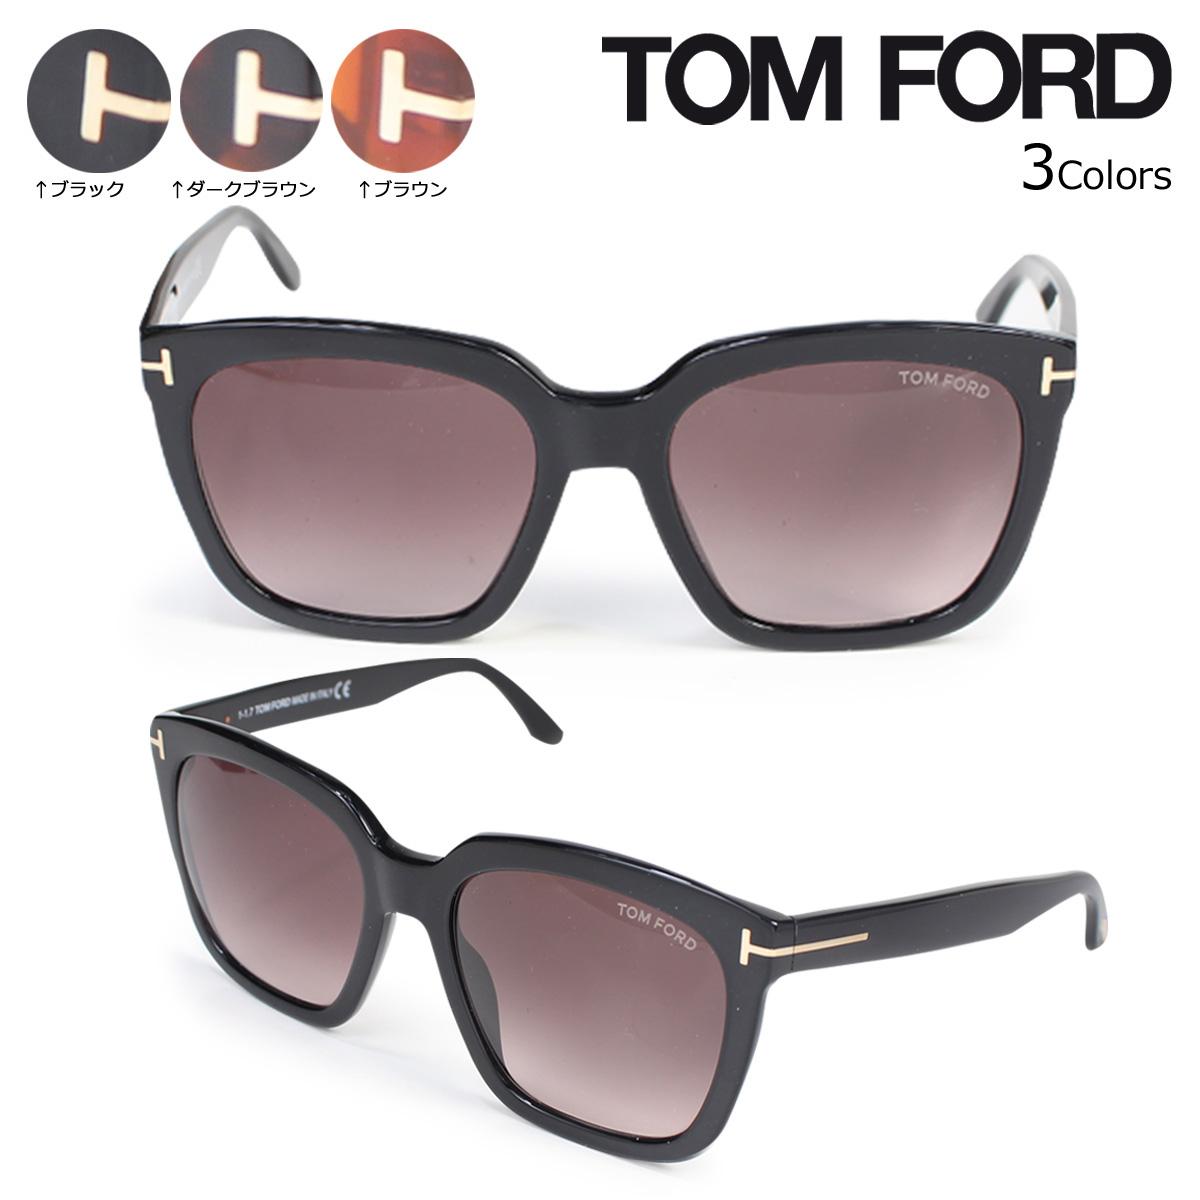 893ce77055084 ALLSPORTS  TOM FORD Tom Ford sunglasses glasses men gap Dis eyewear ...